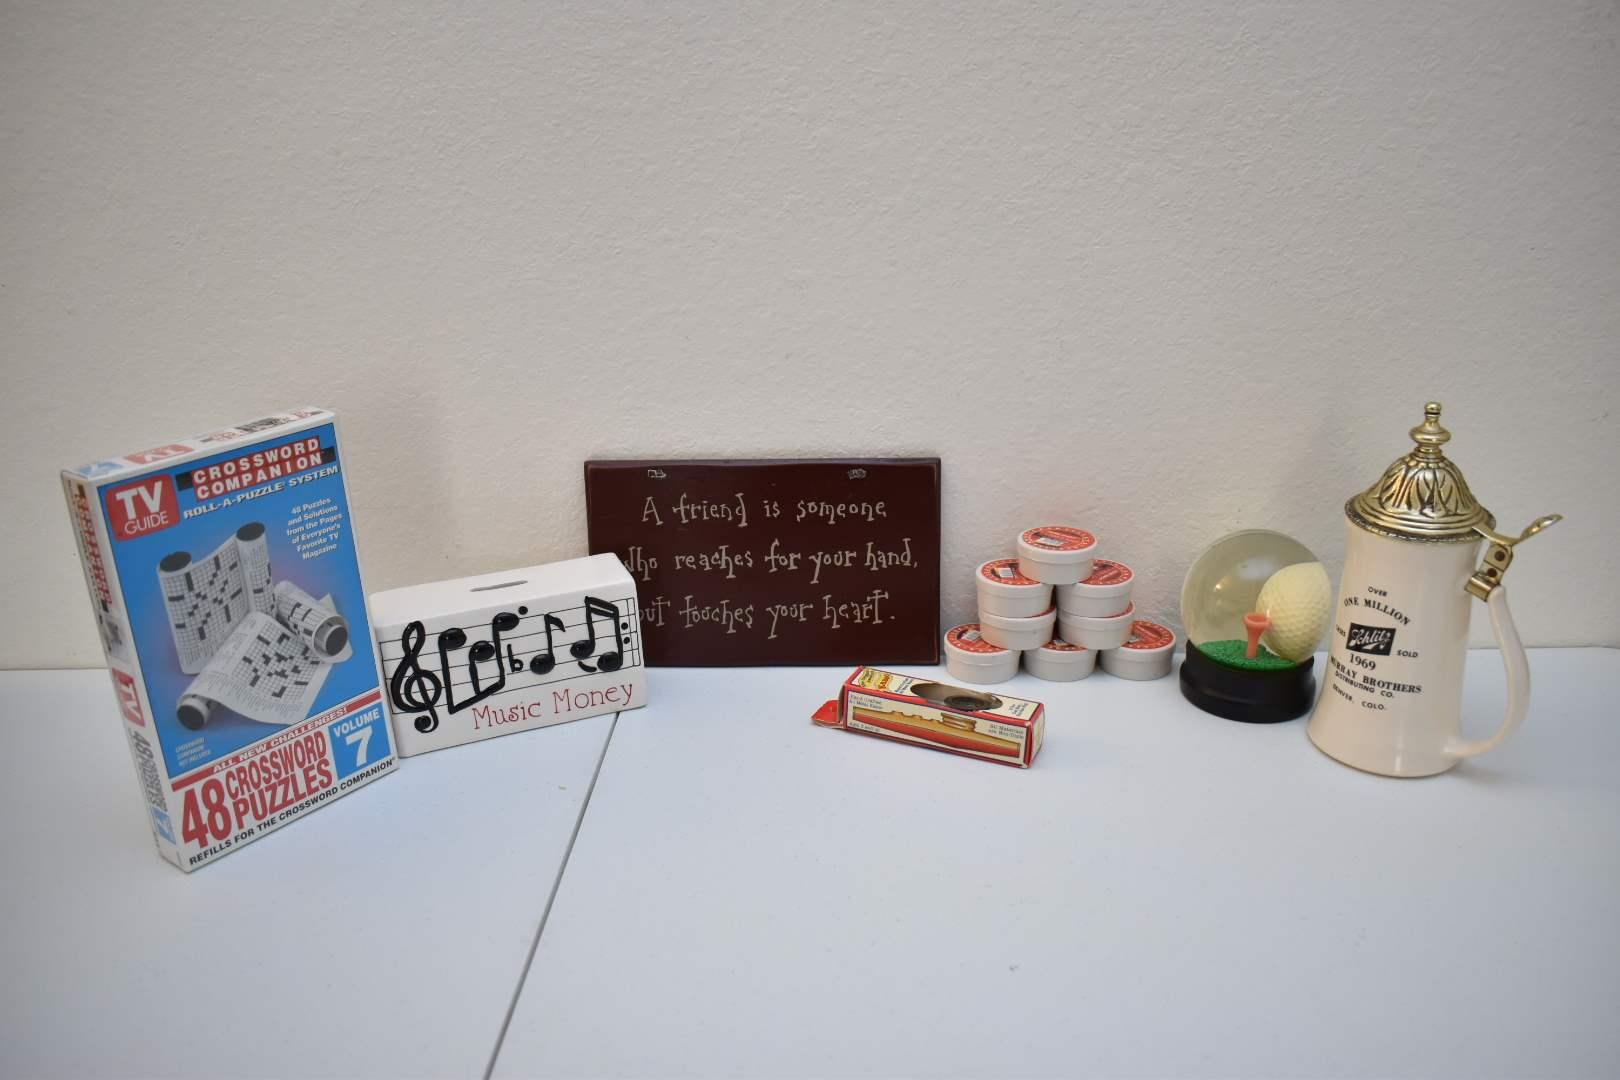 (1600) Sureshot Pellets, NEW Vintage TVGuide Crossword Companion, Vintage Kazoo in Box, Collectibles, Decor,